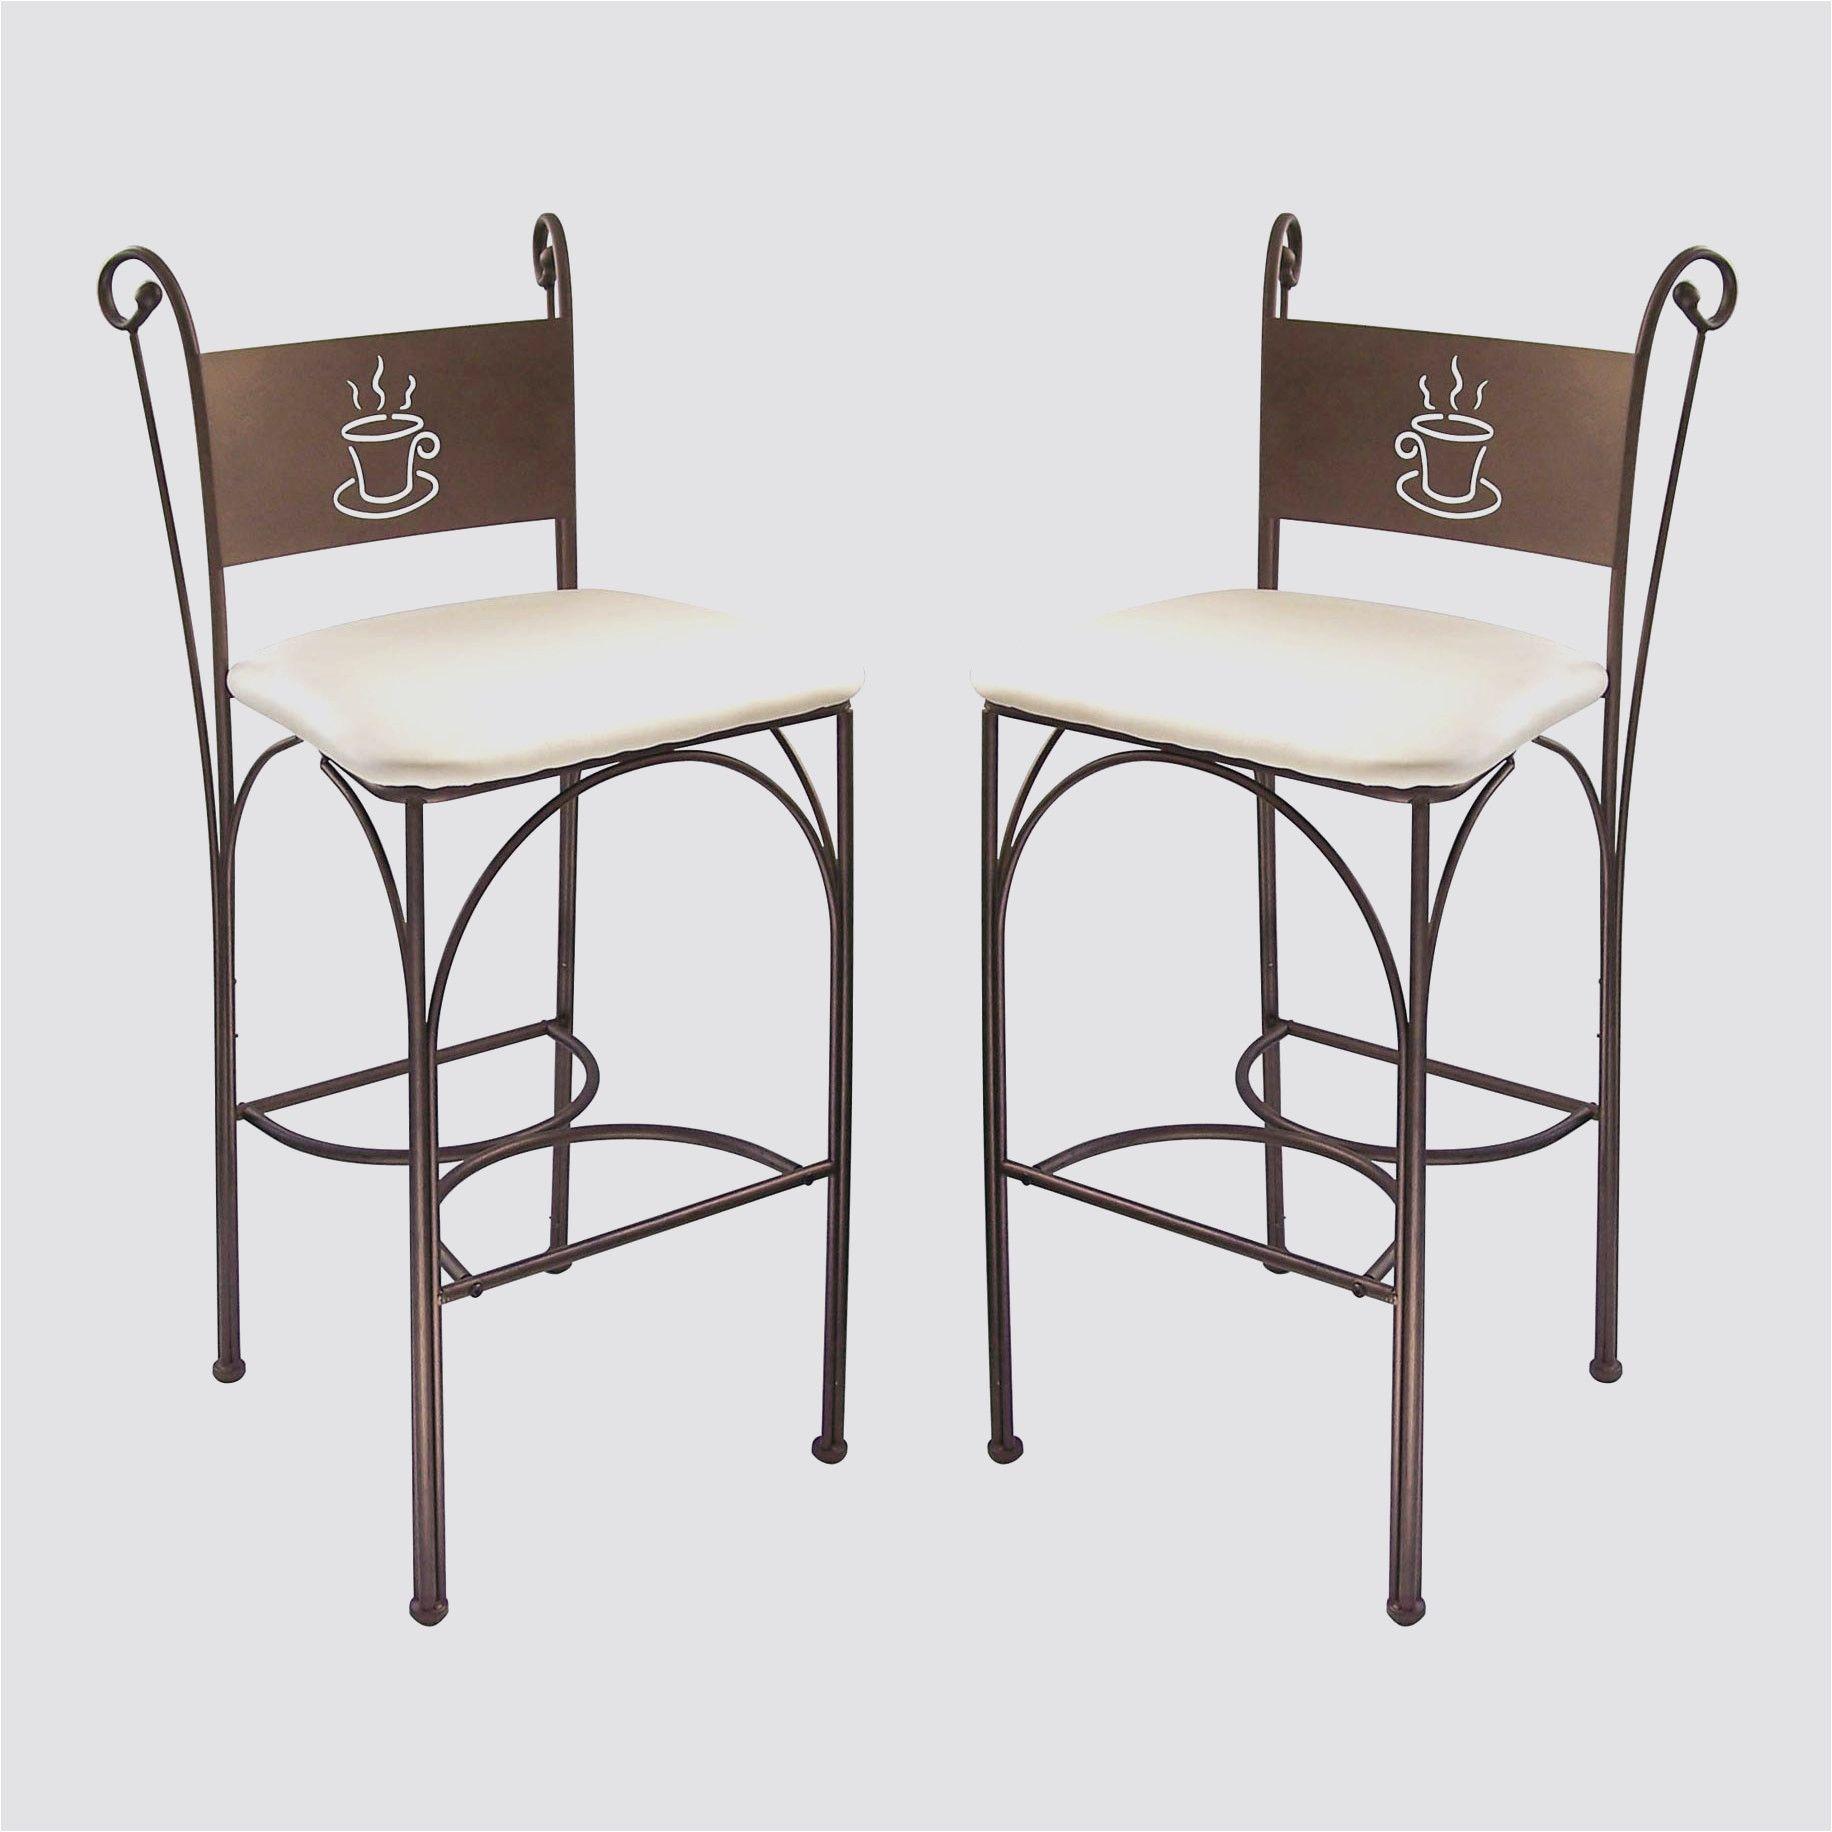 New Conforama Epagny Chaise Haute Pliante Chaise Rotin Meuble Salle De Bain Une Vasque